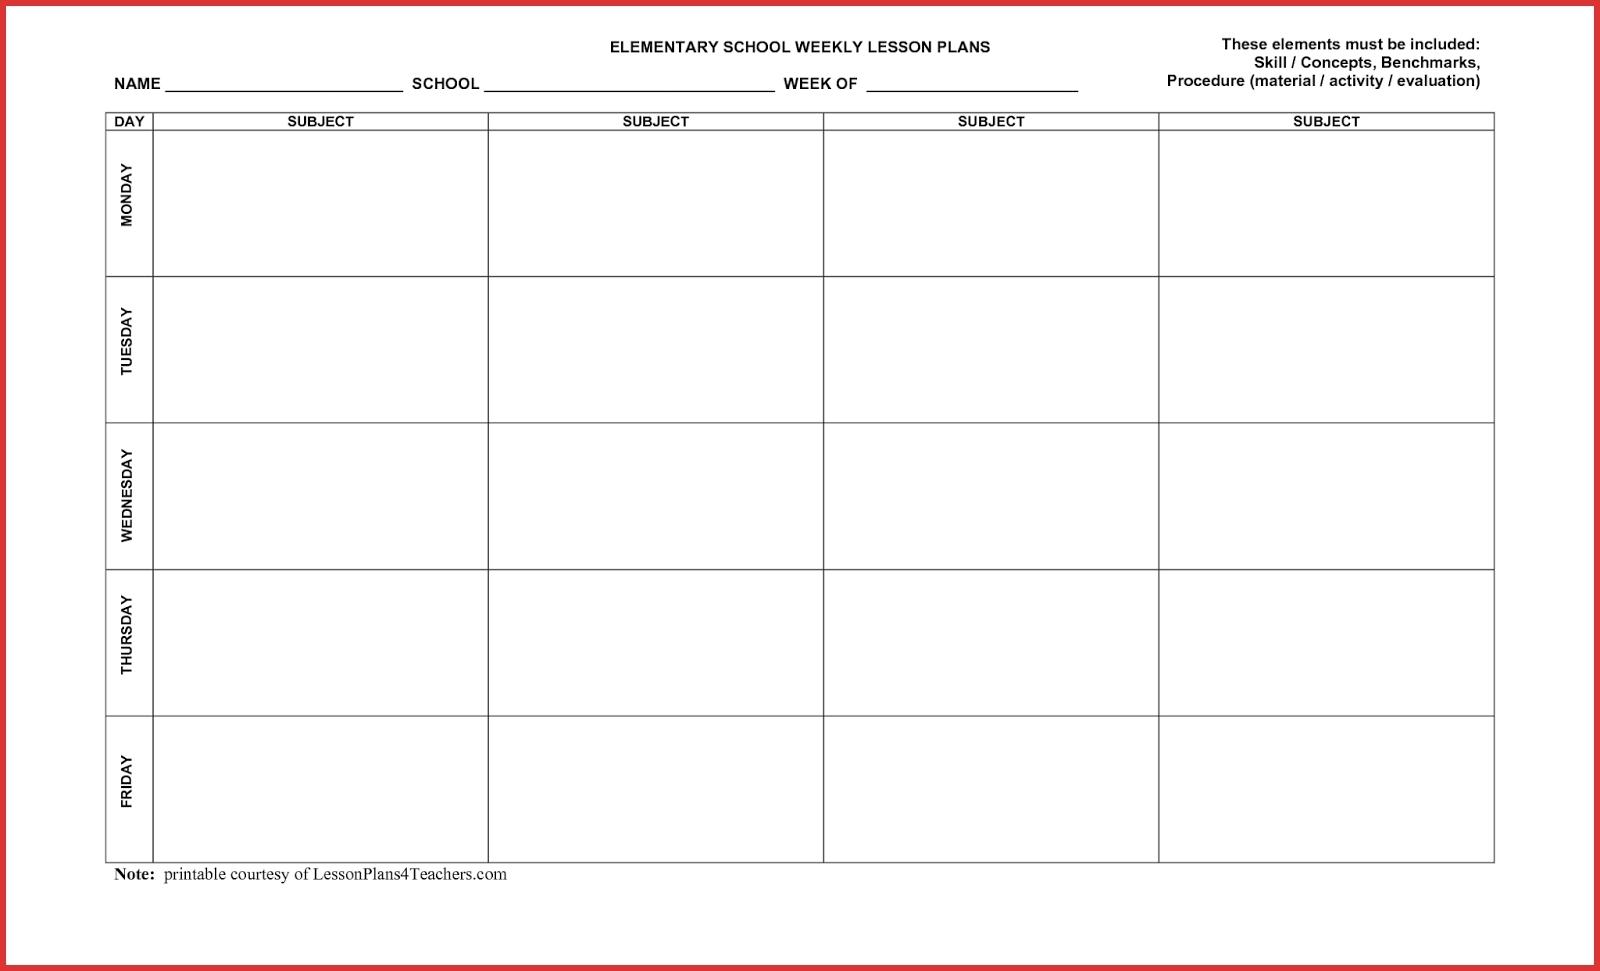 Day Weekly Calendar Template E2 80 93 Week Schedule Microsoft Word throughout 5 Day Weekly Calendar Template